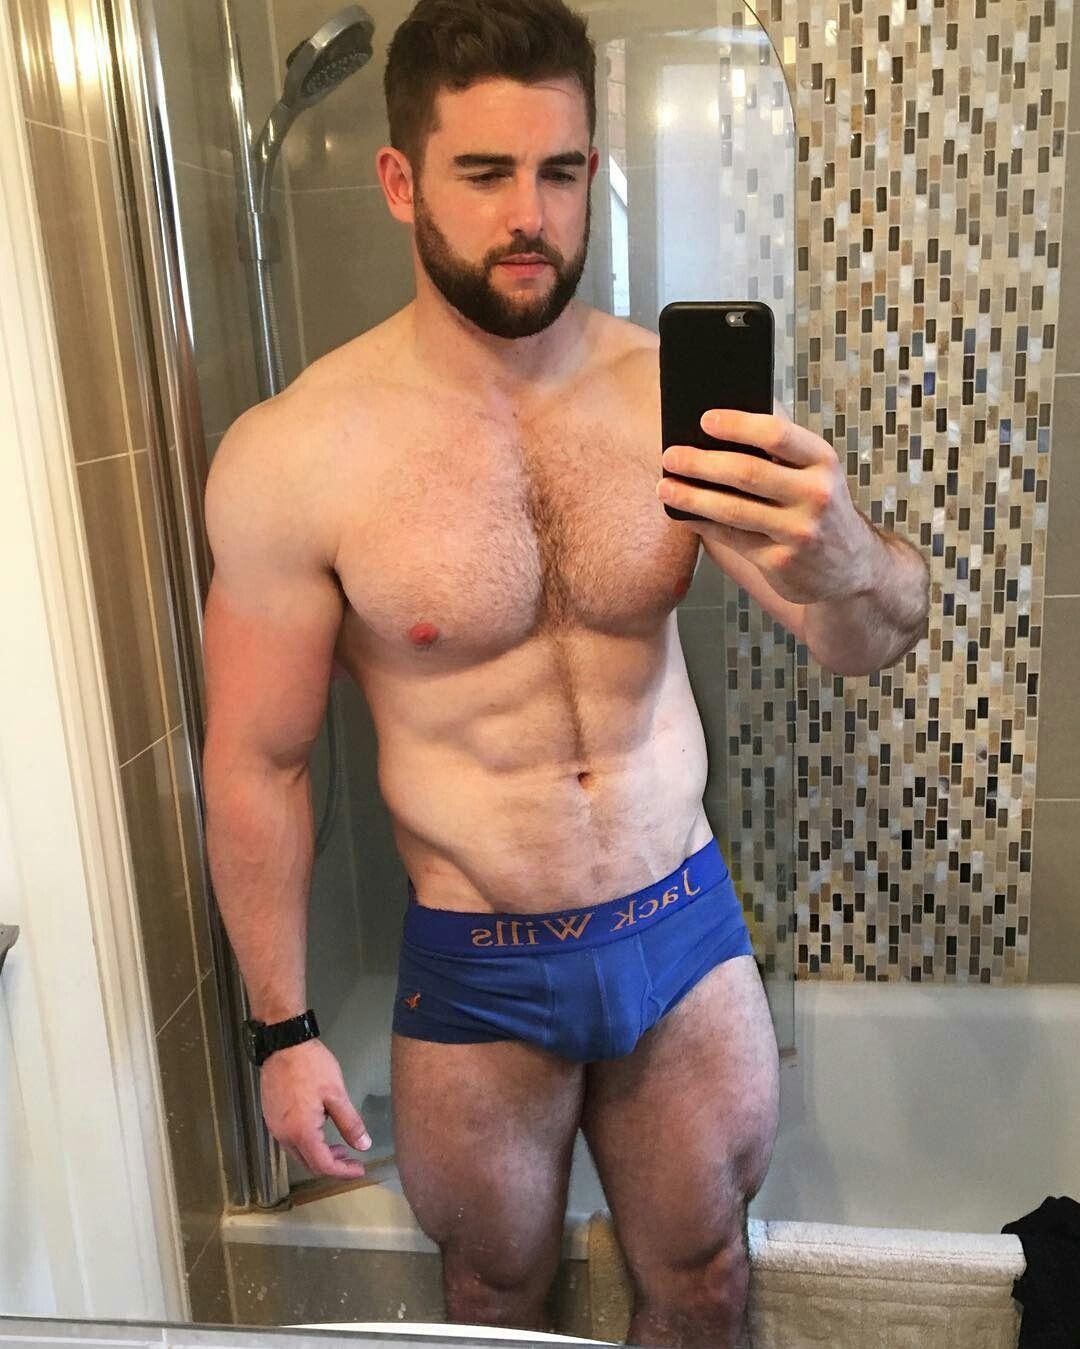 Hairy gay hunks tumblr